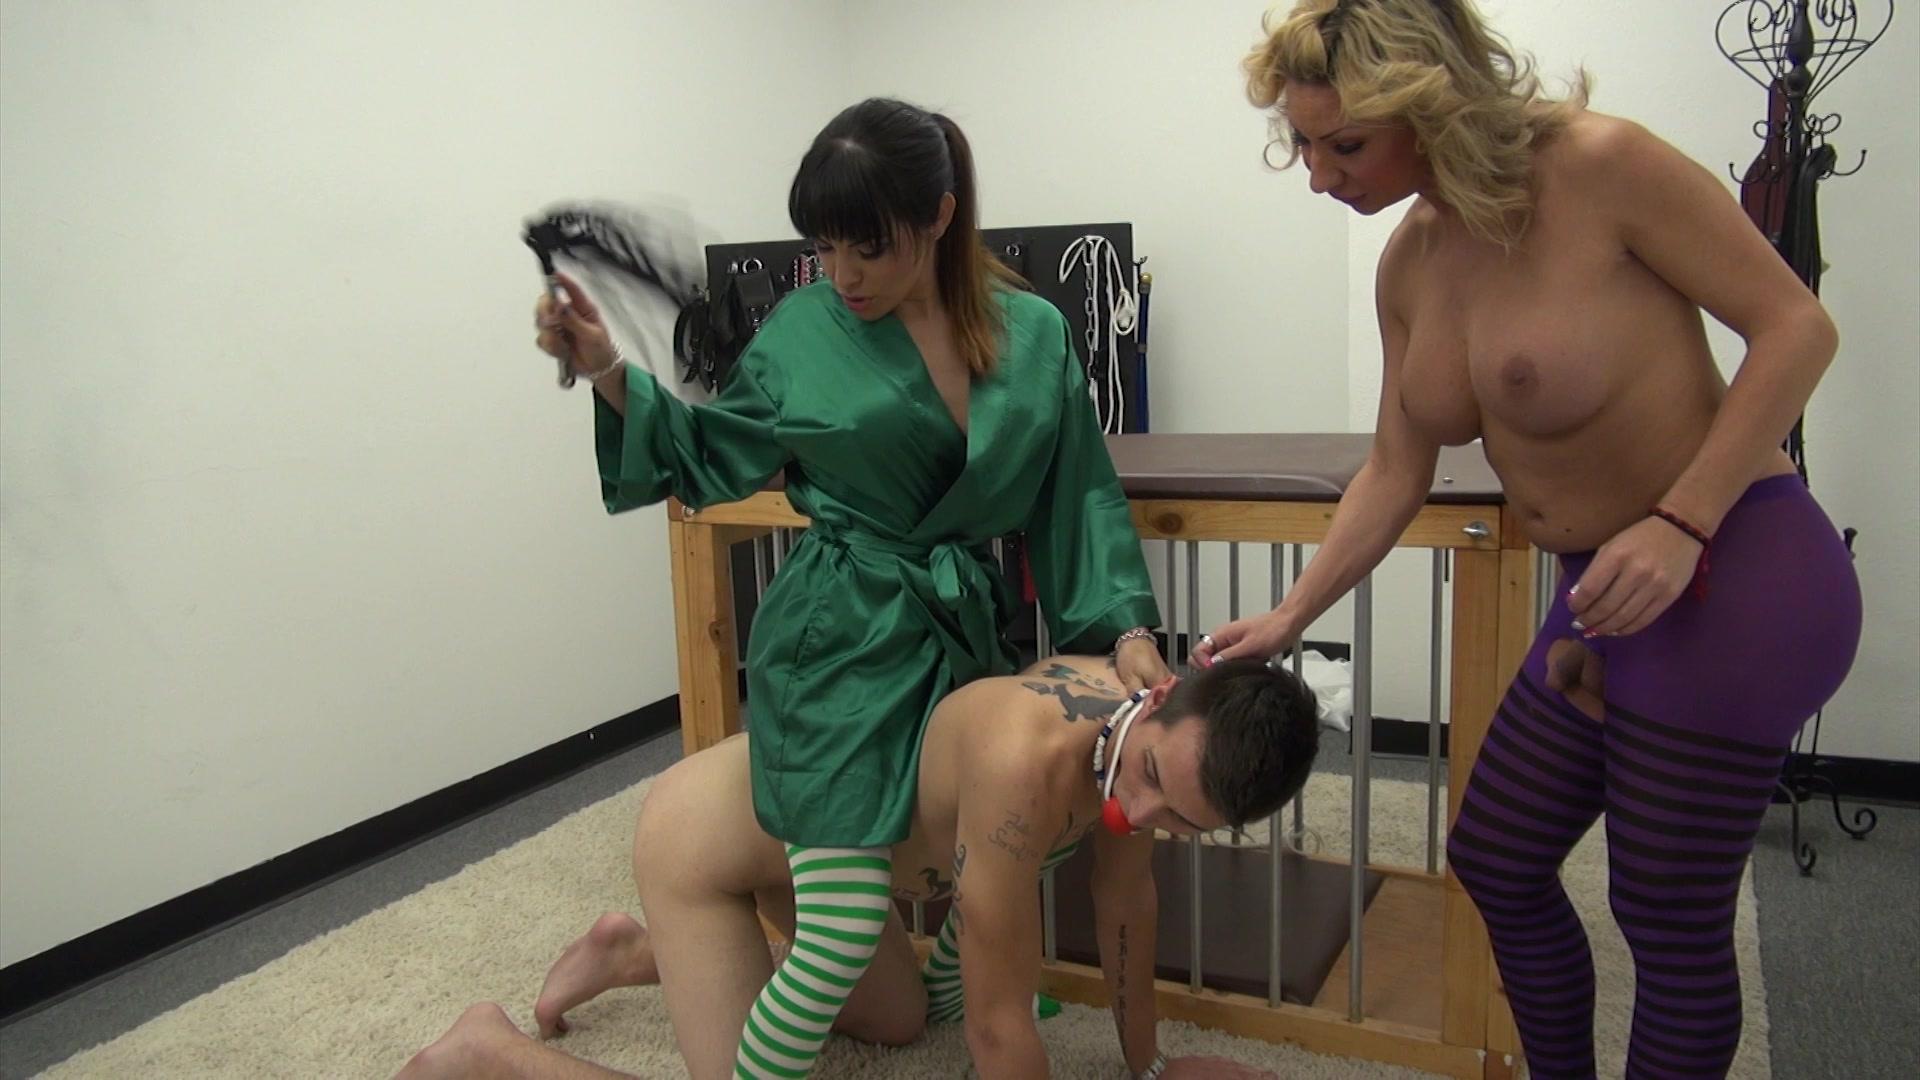 Oiled naked women sex boobs